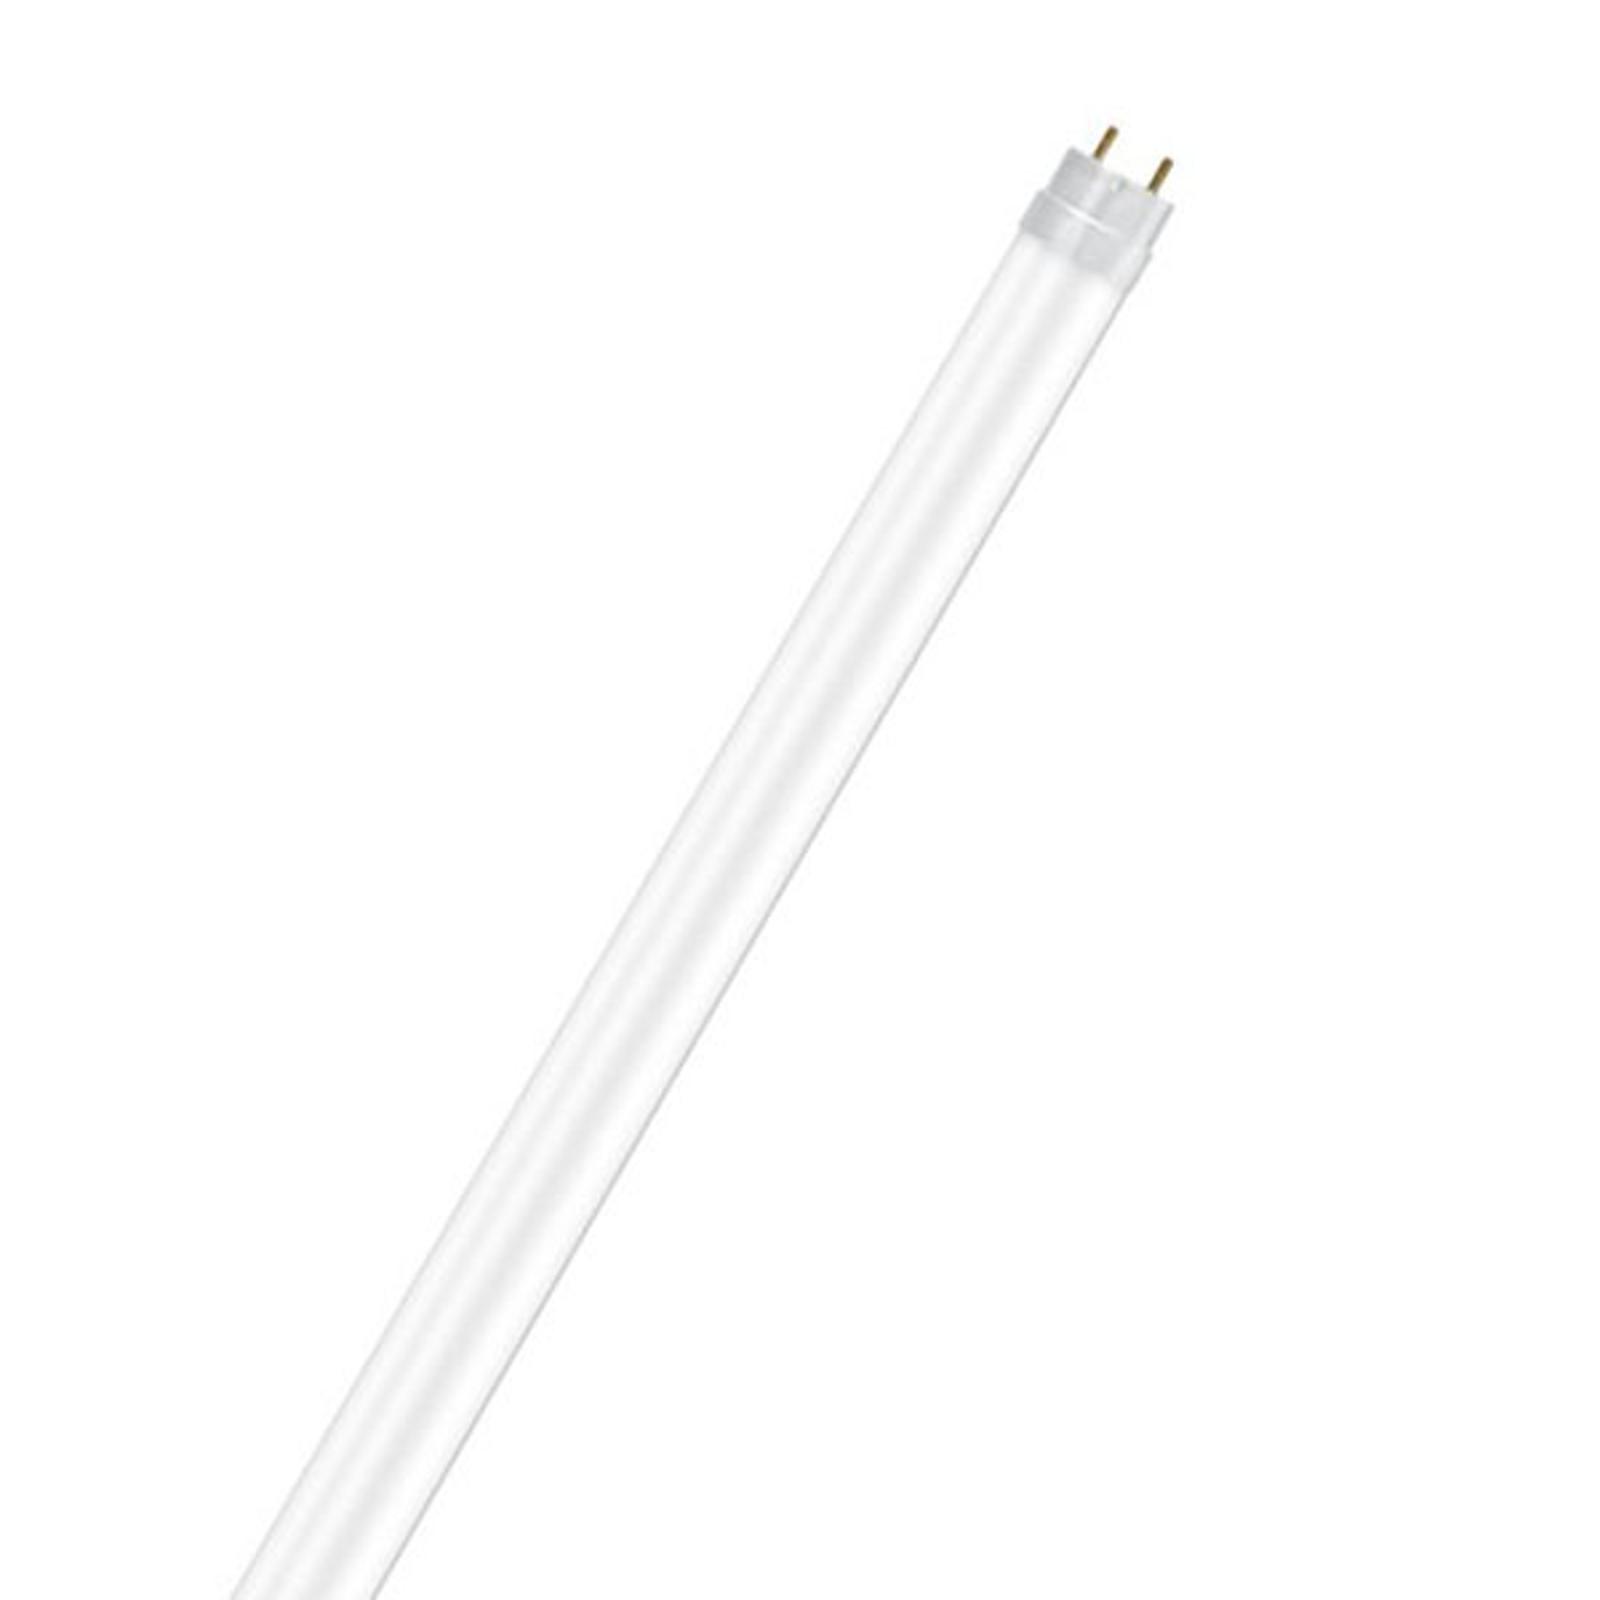 OSRAM-LED-putki G13 150cm SubstiTUBE PC 18W 3000 K